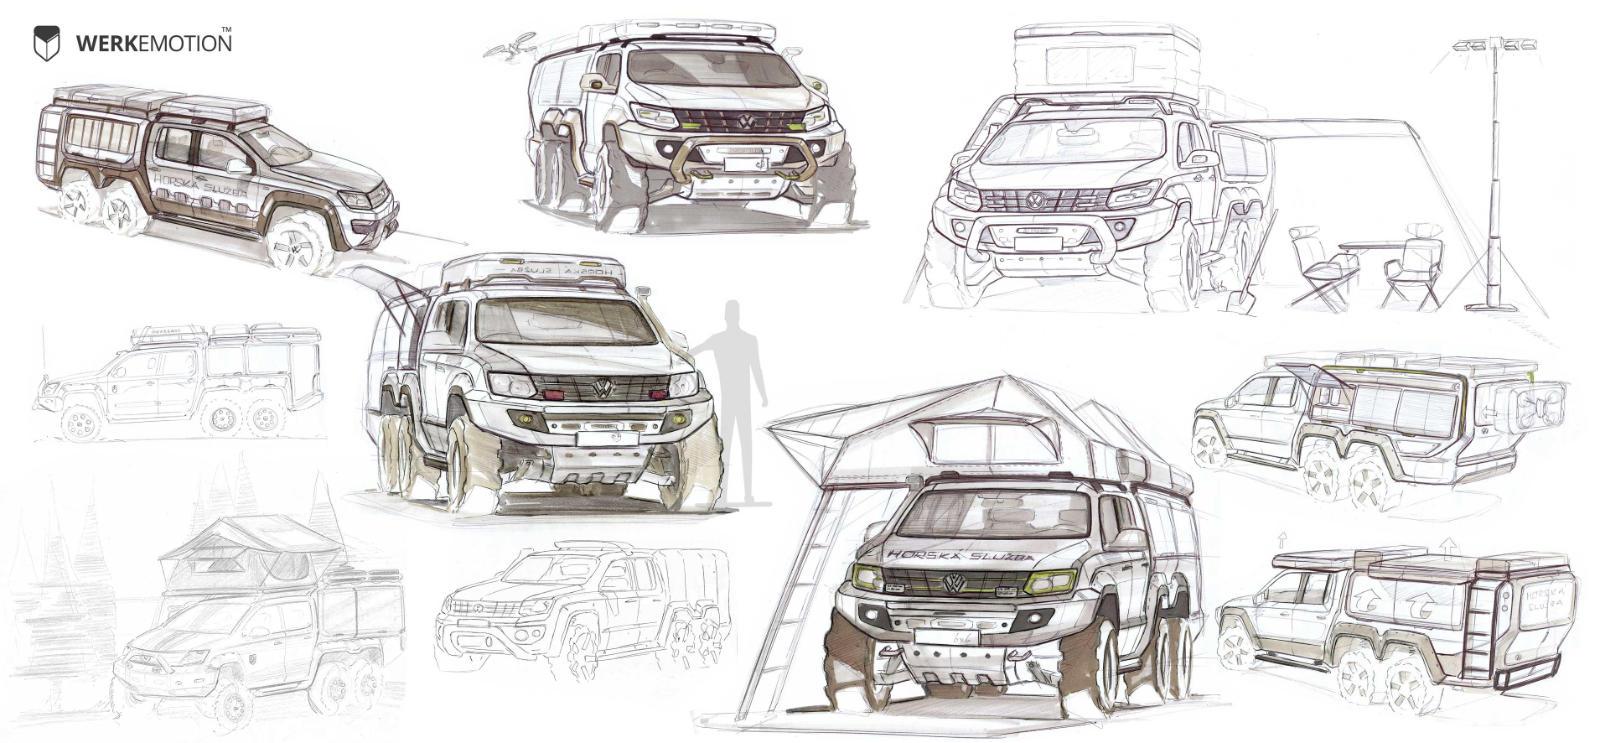 VW Amarok 6x6 - Firefighter and Rescue service special vehicle - Design by WERKEMOTION design stuido